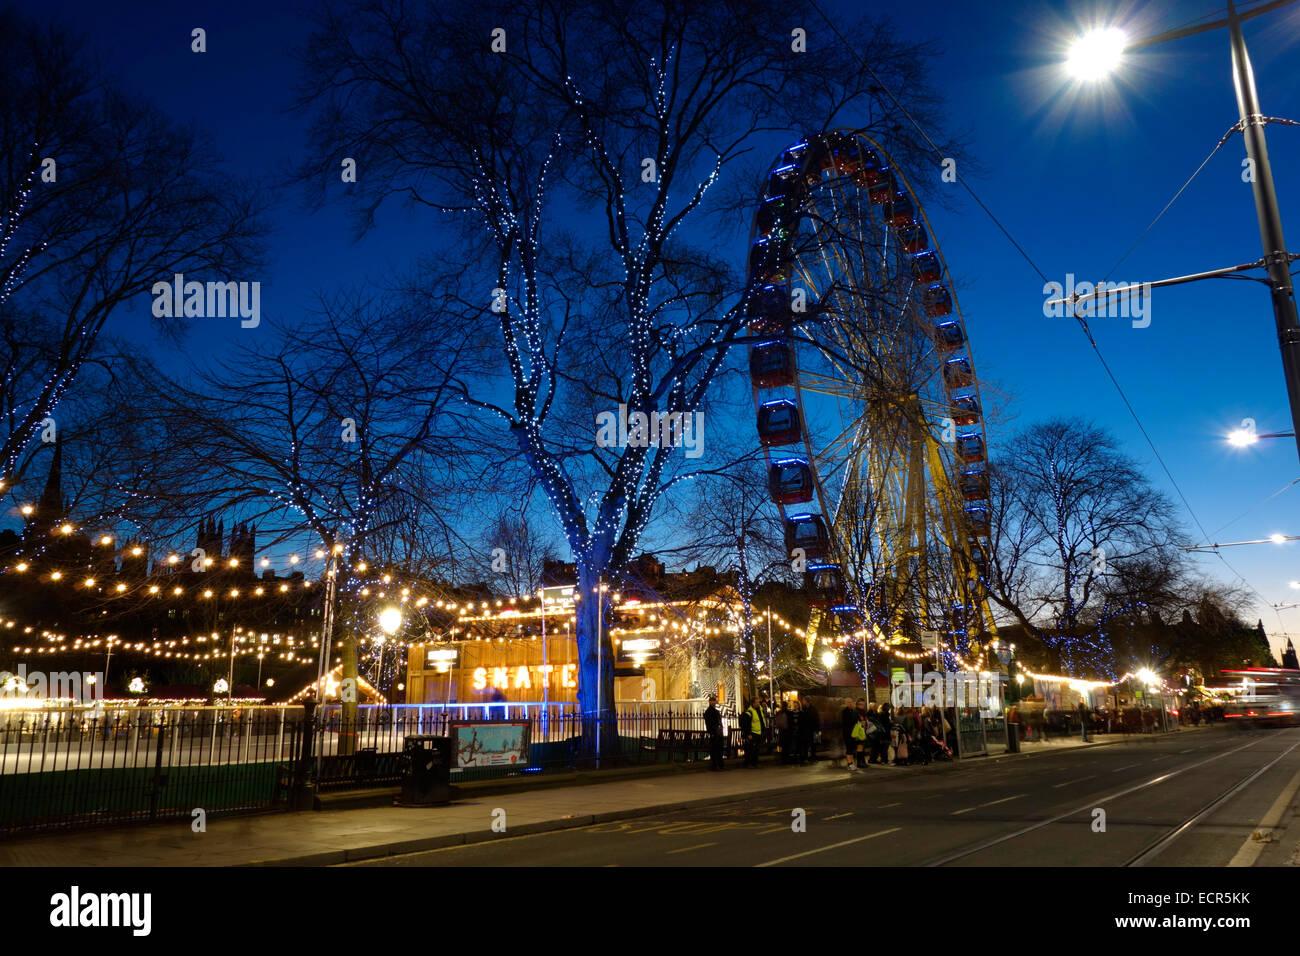 The Big Wheel and ice rink at the Edinburgh Christmas Fair Stock Photo